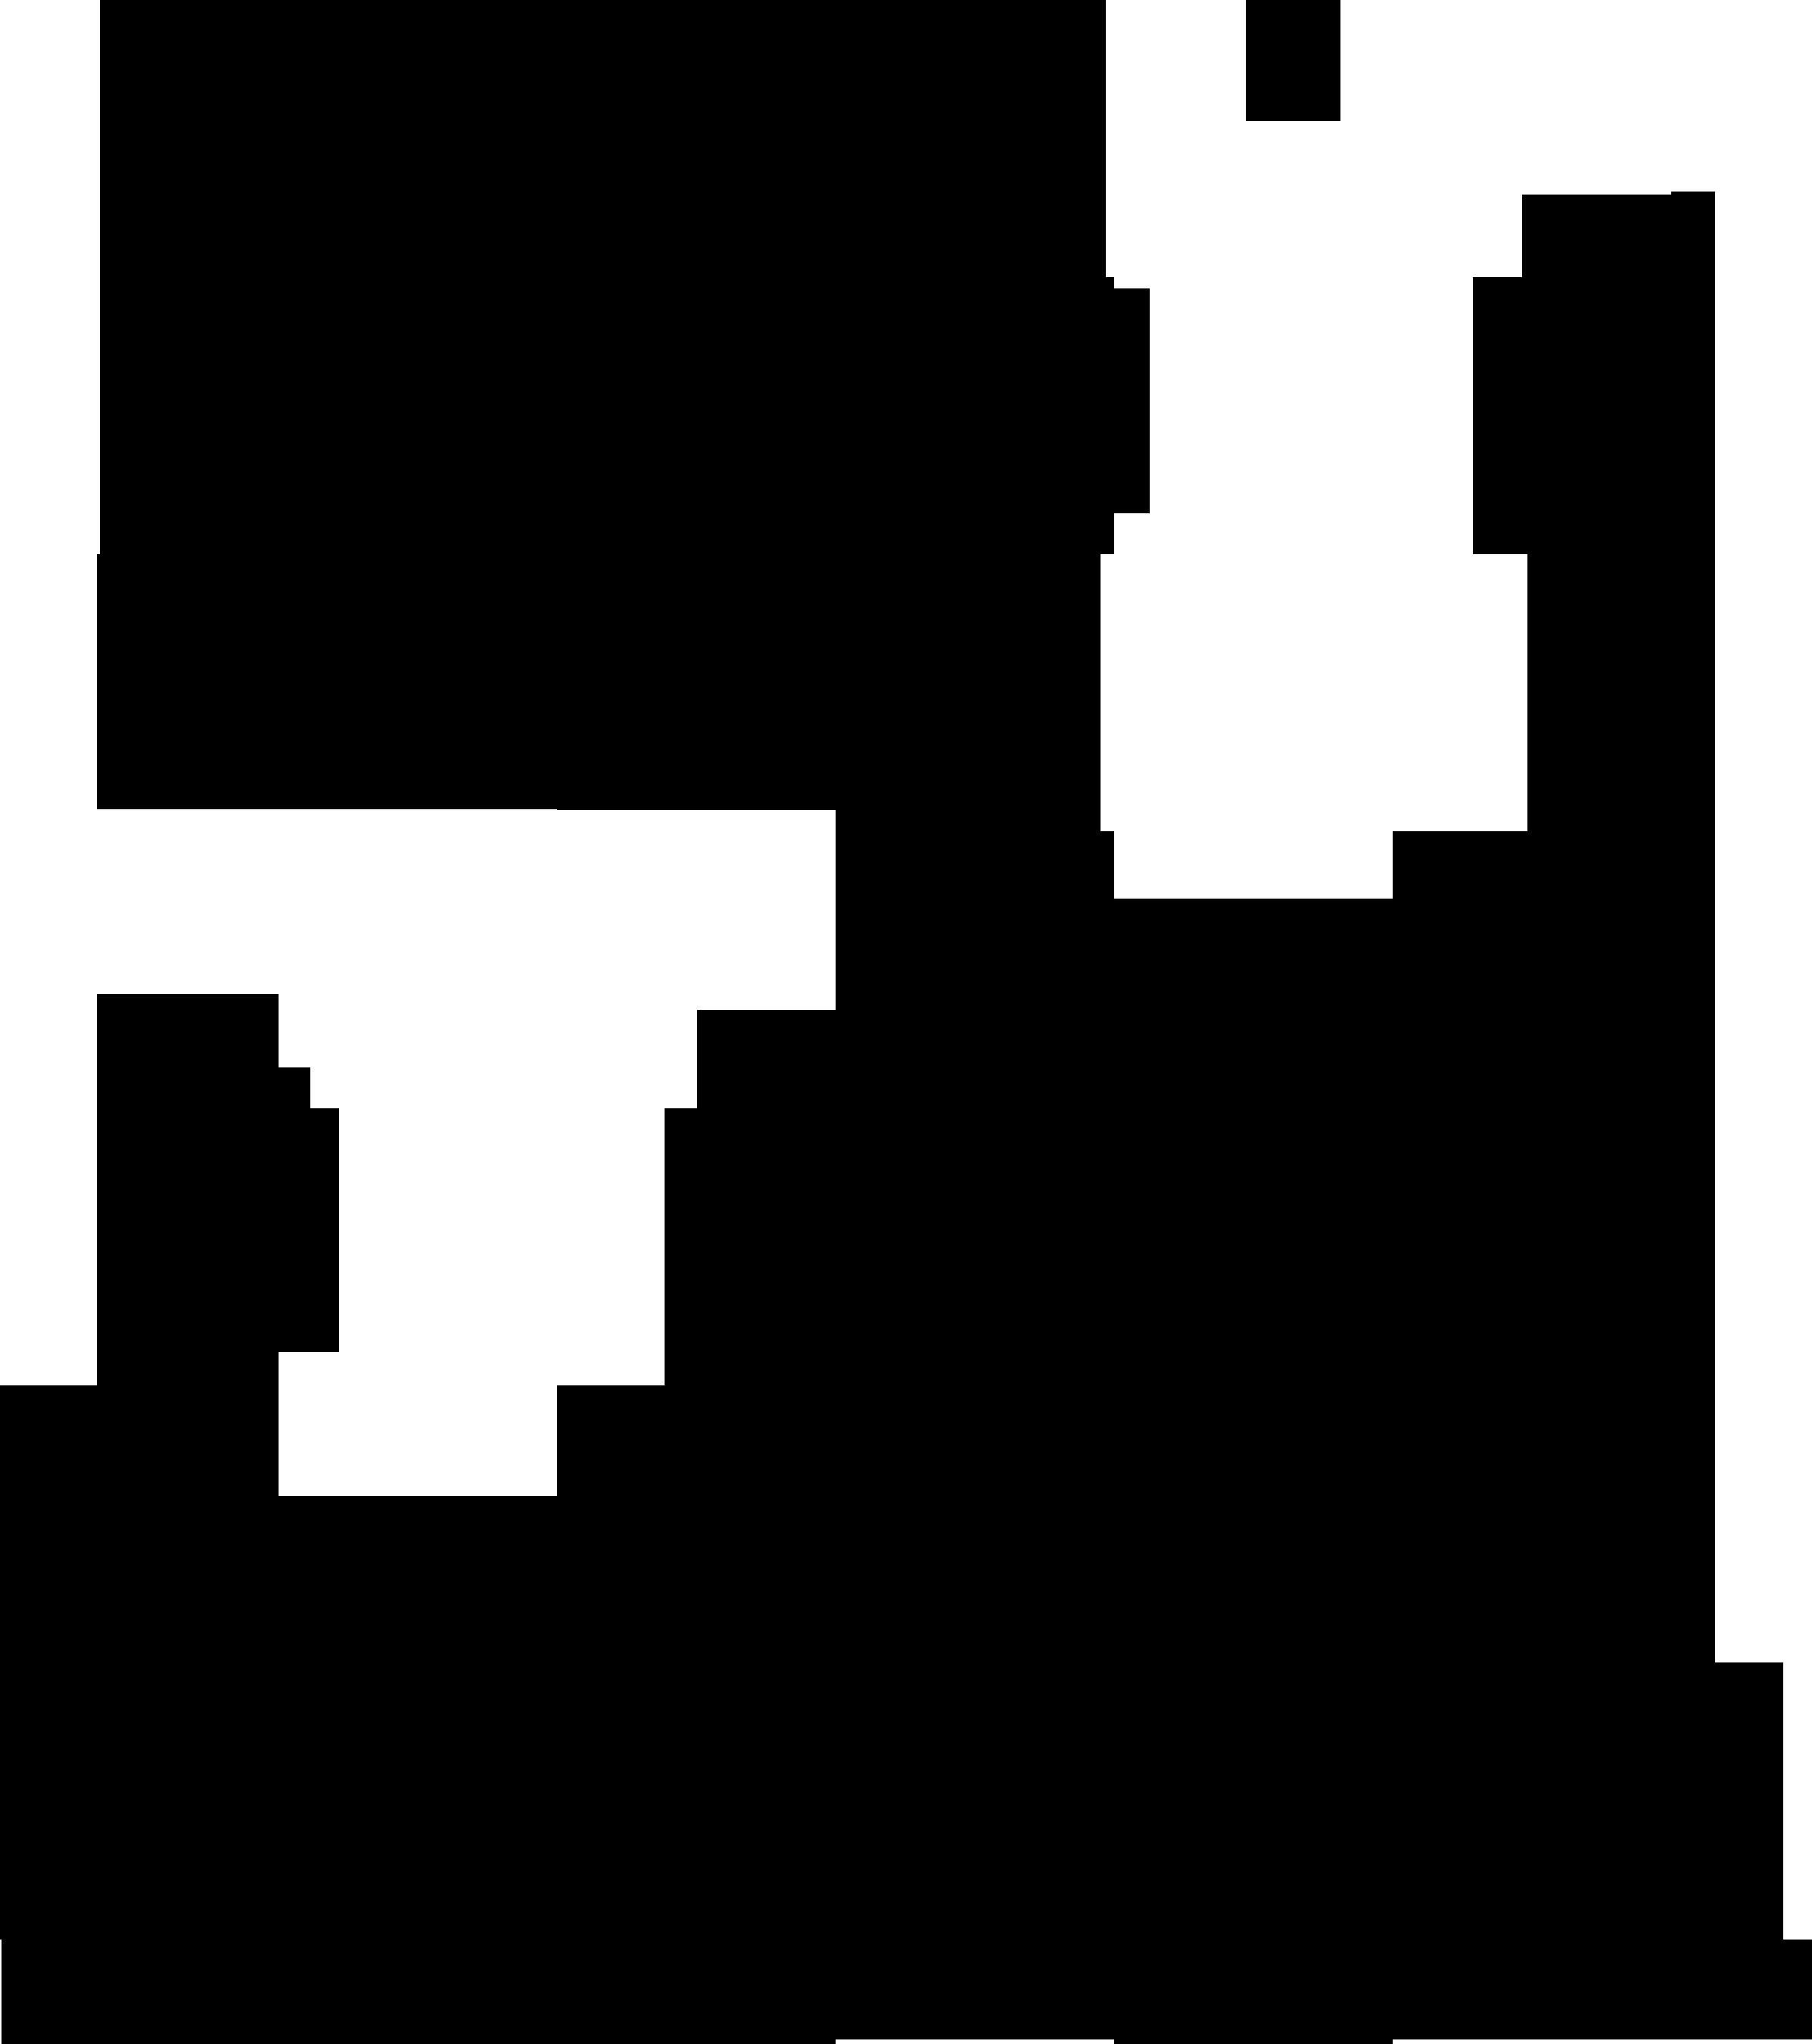 Usocia-logo